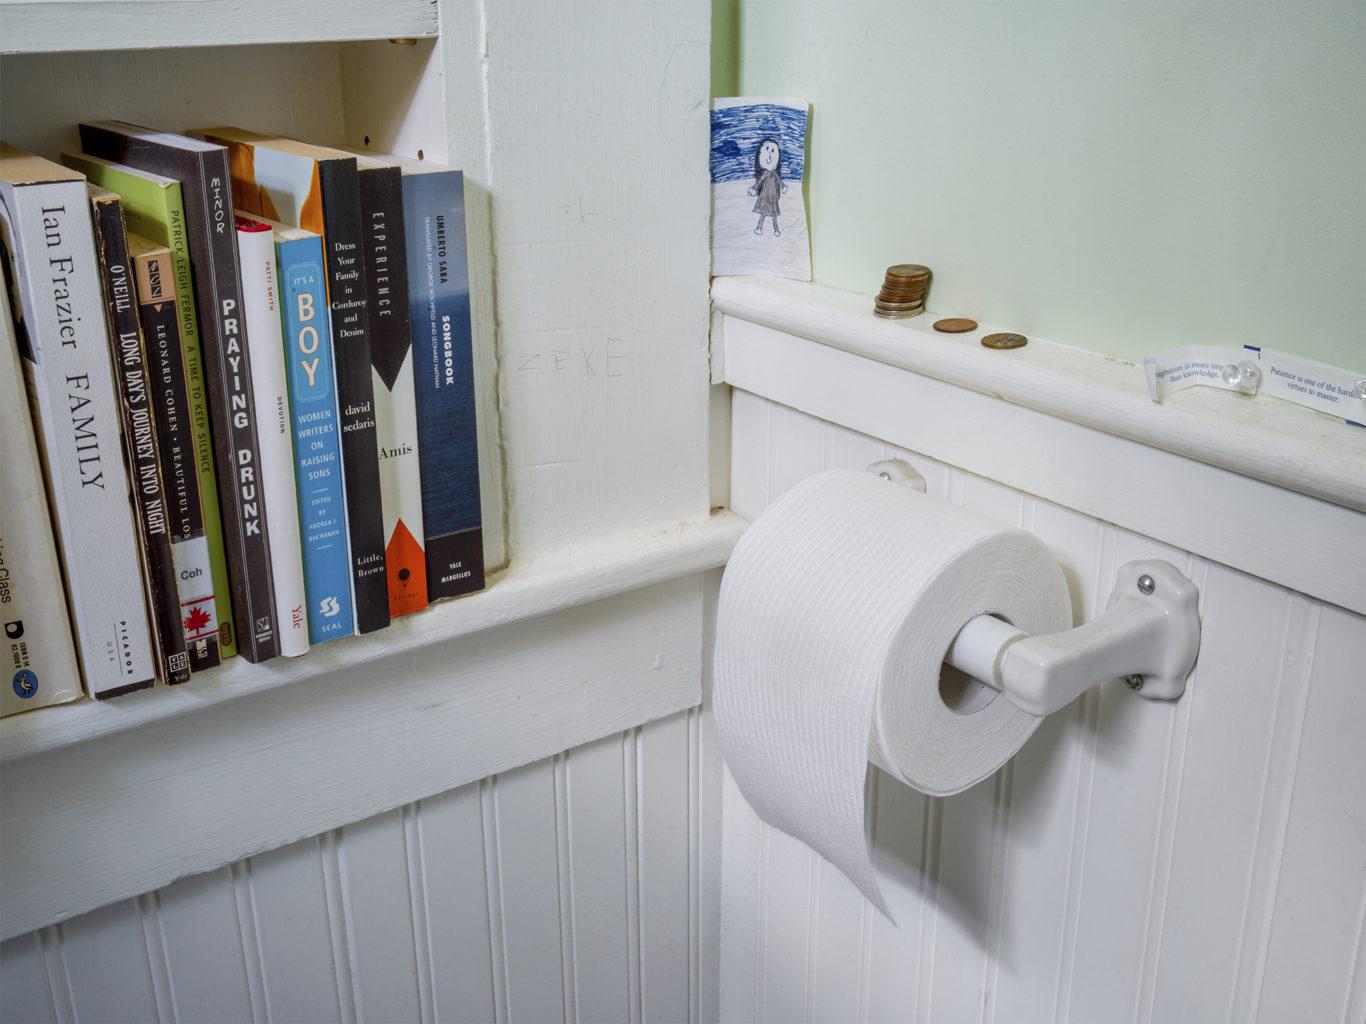 Week 2: <em> Bathroom</em>, Justin Kimball, April 18, 2020